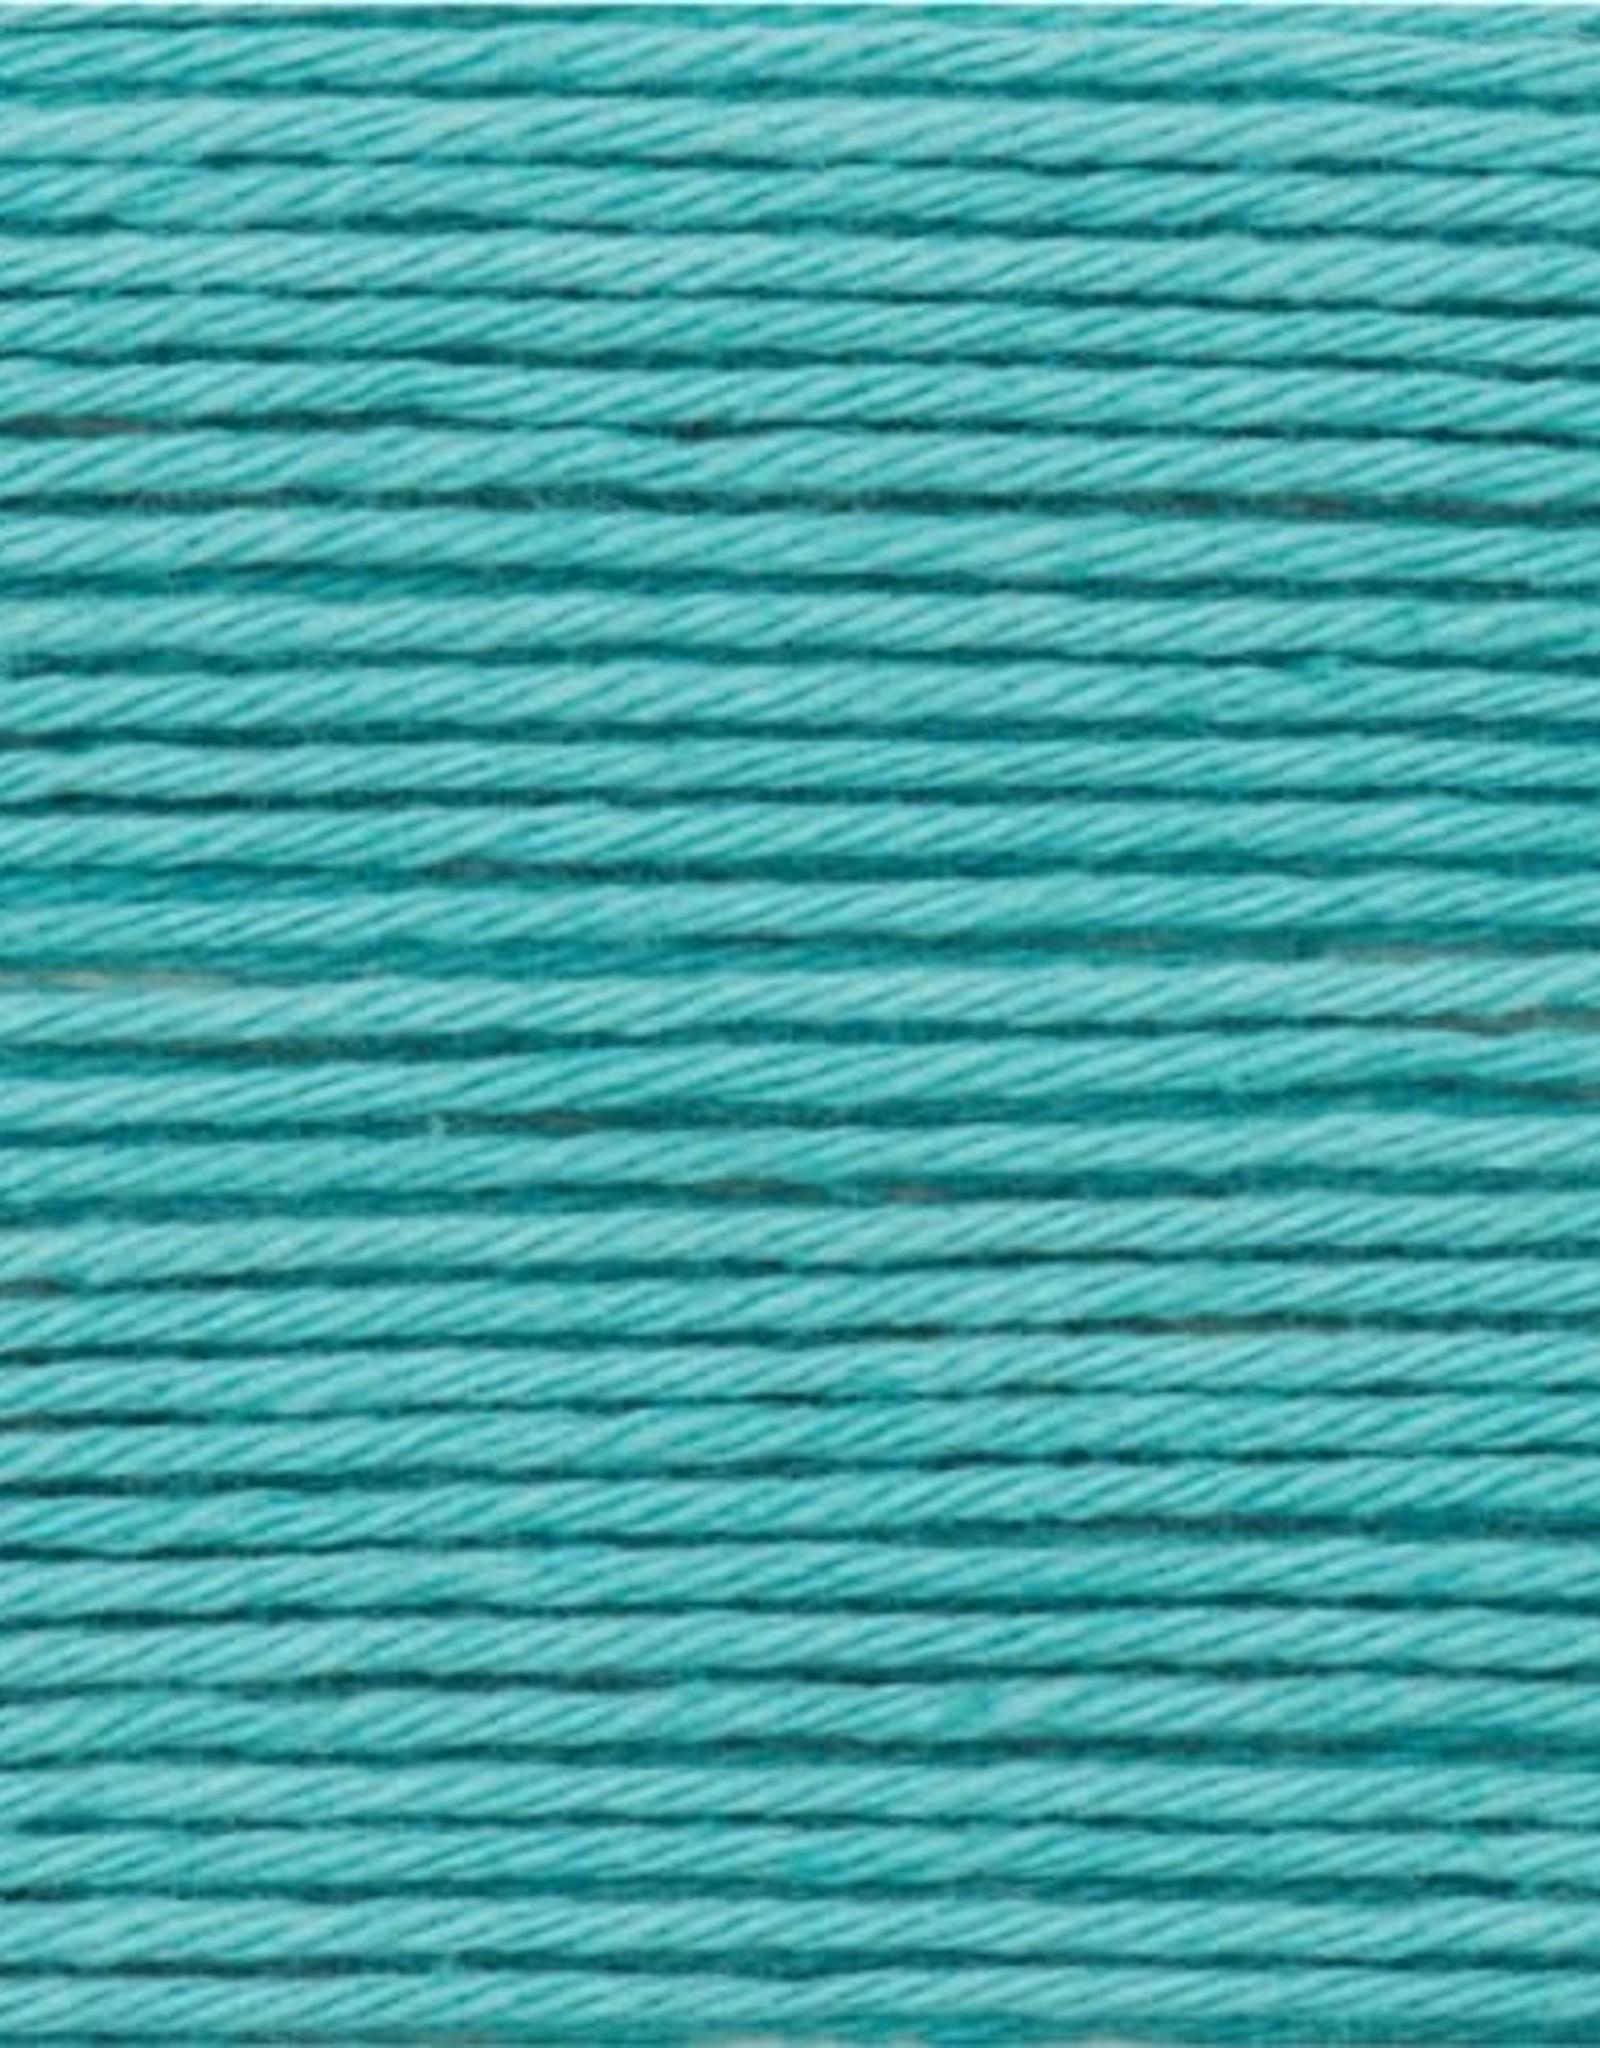 Rico Design Creative Ricorumi turquoise 039